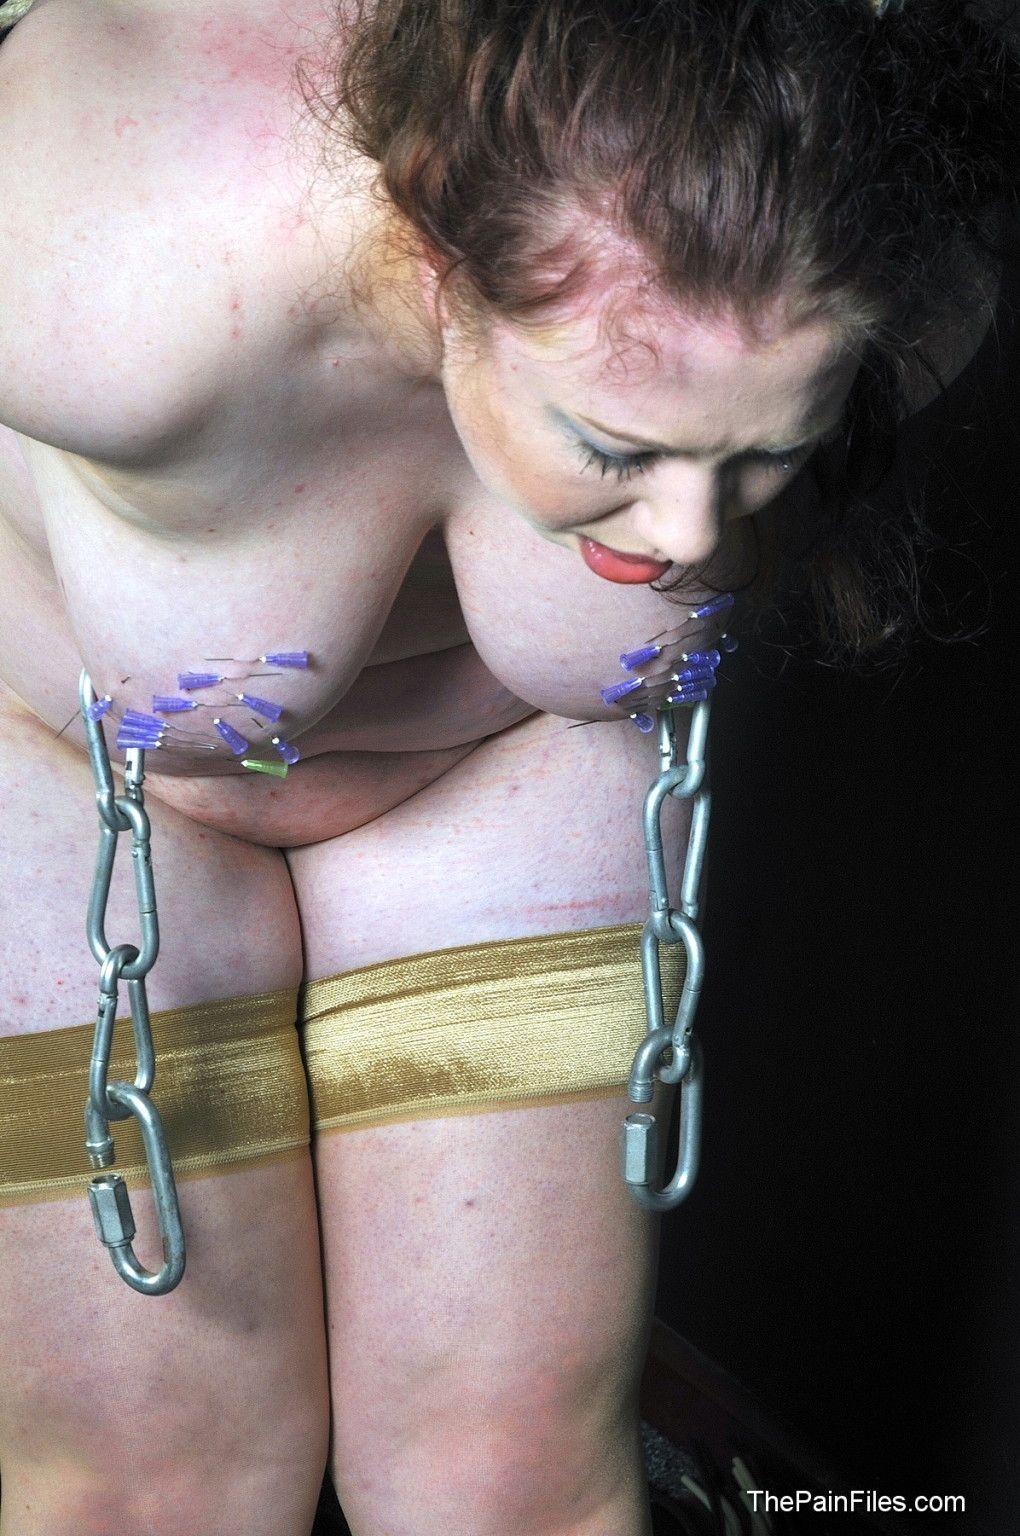 Amateur needle bdsm and extreme tit torture of bbw slavegirl rosieb in hardcore